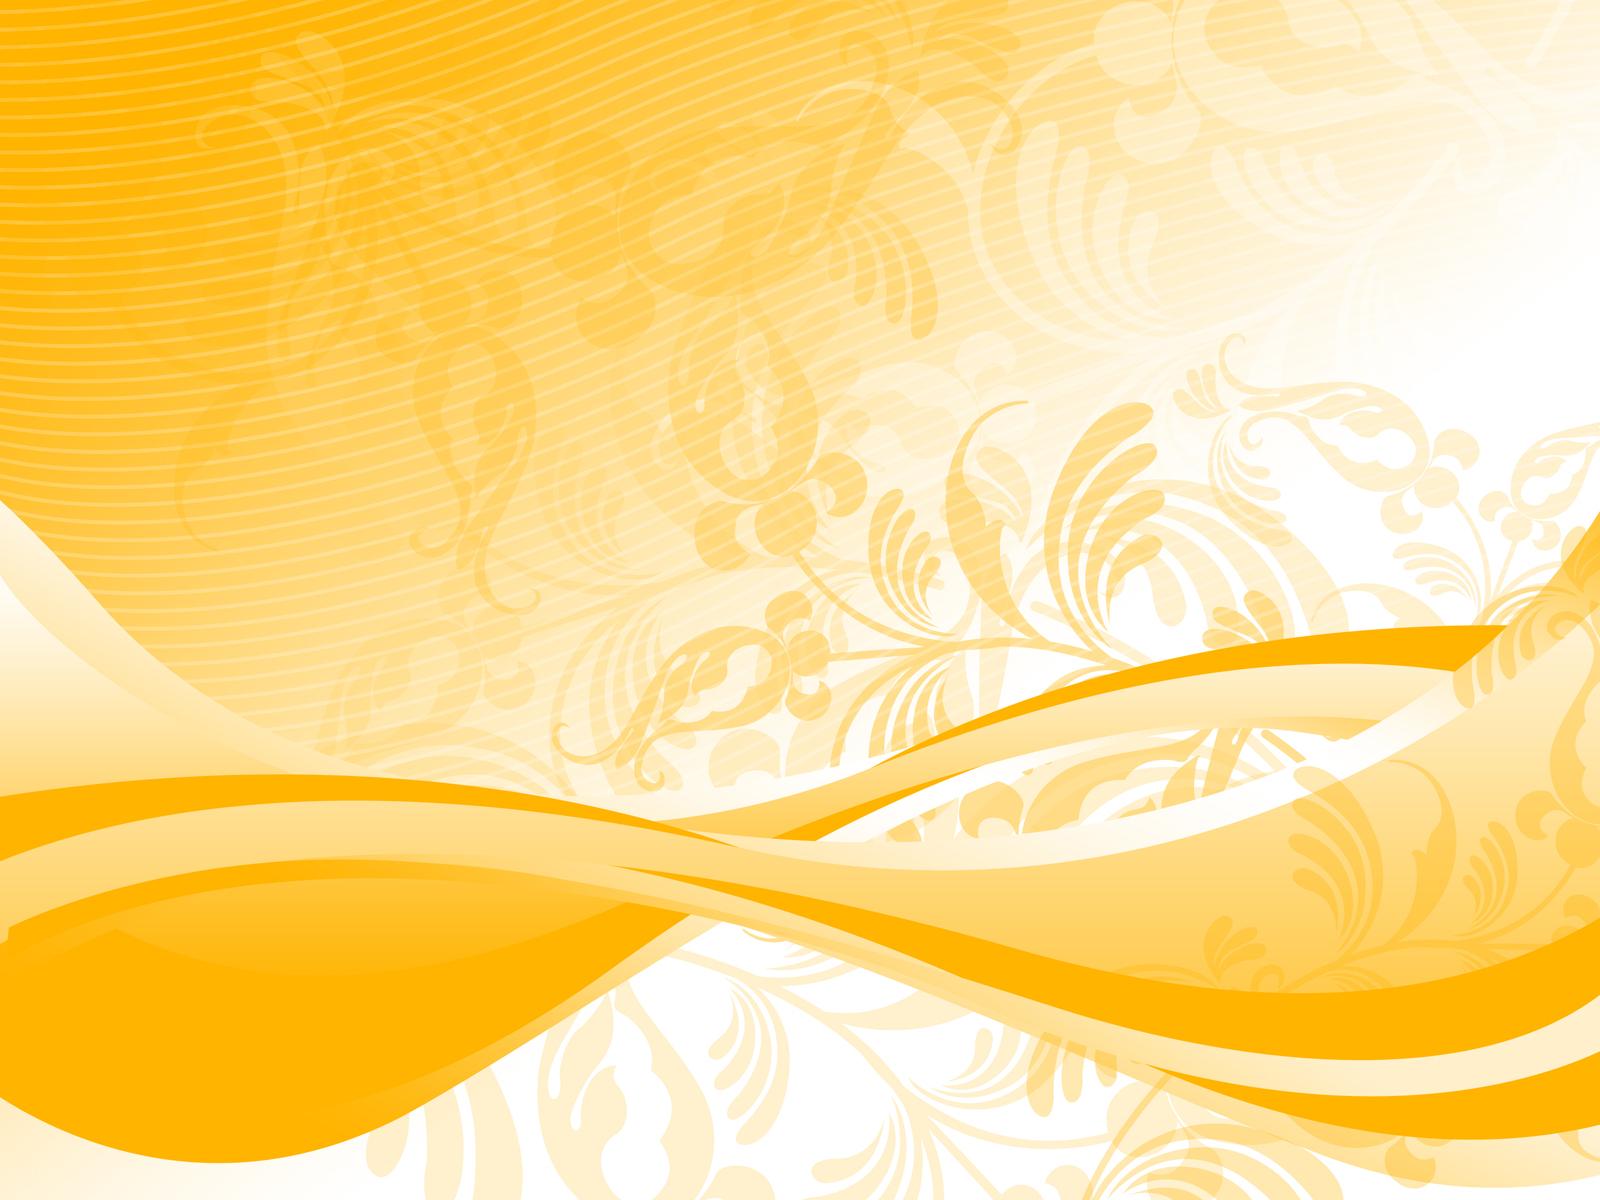 Orange Abstract Backgrounds Yellow orange 1600x1200